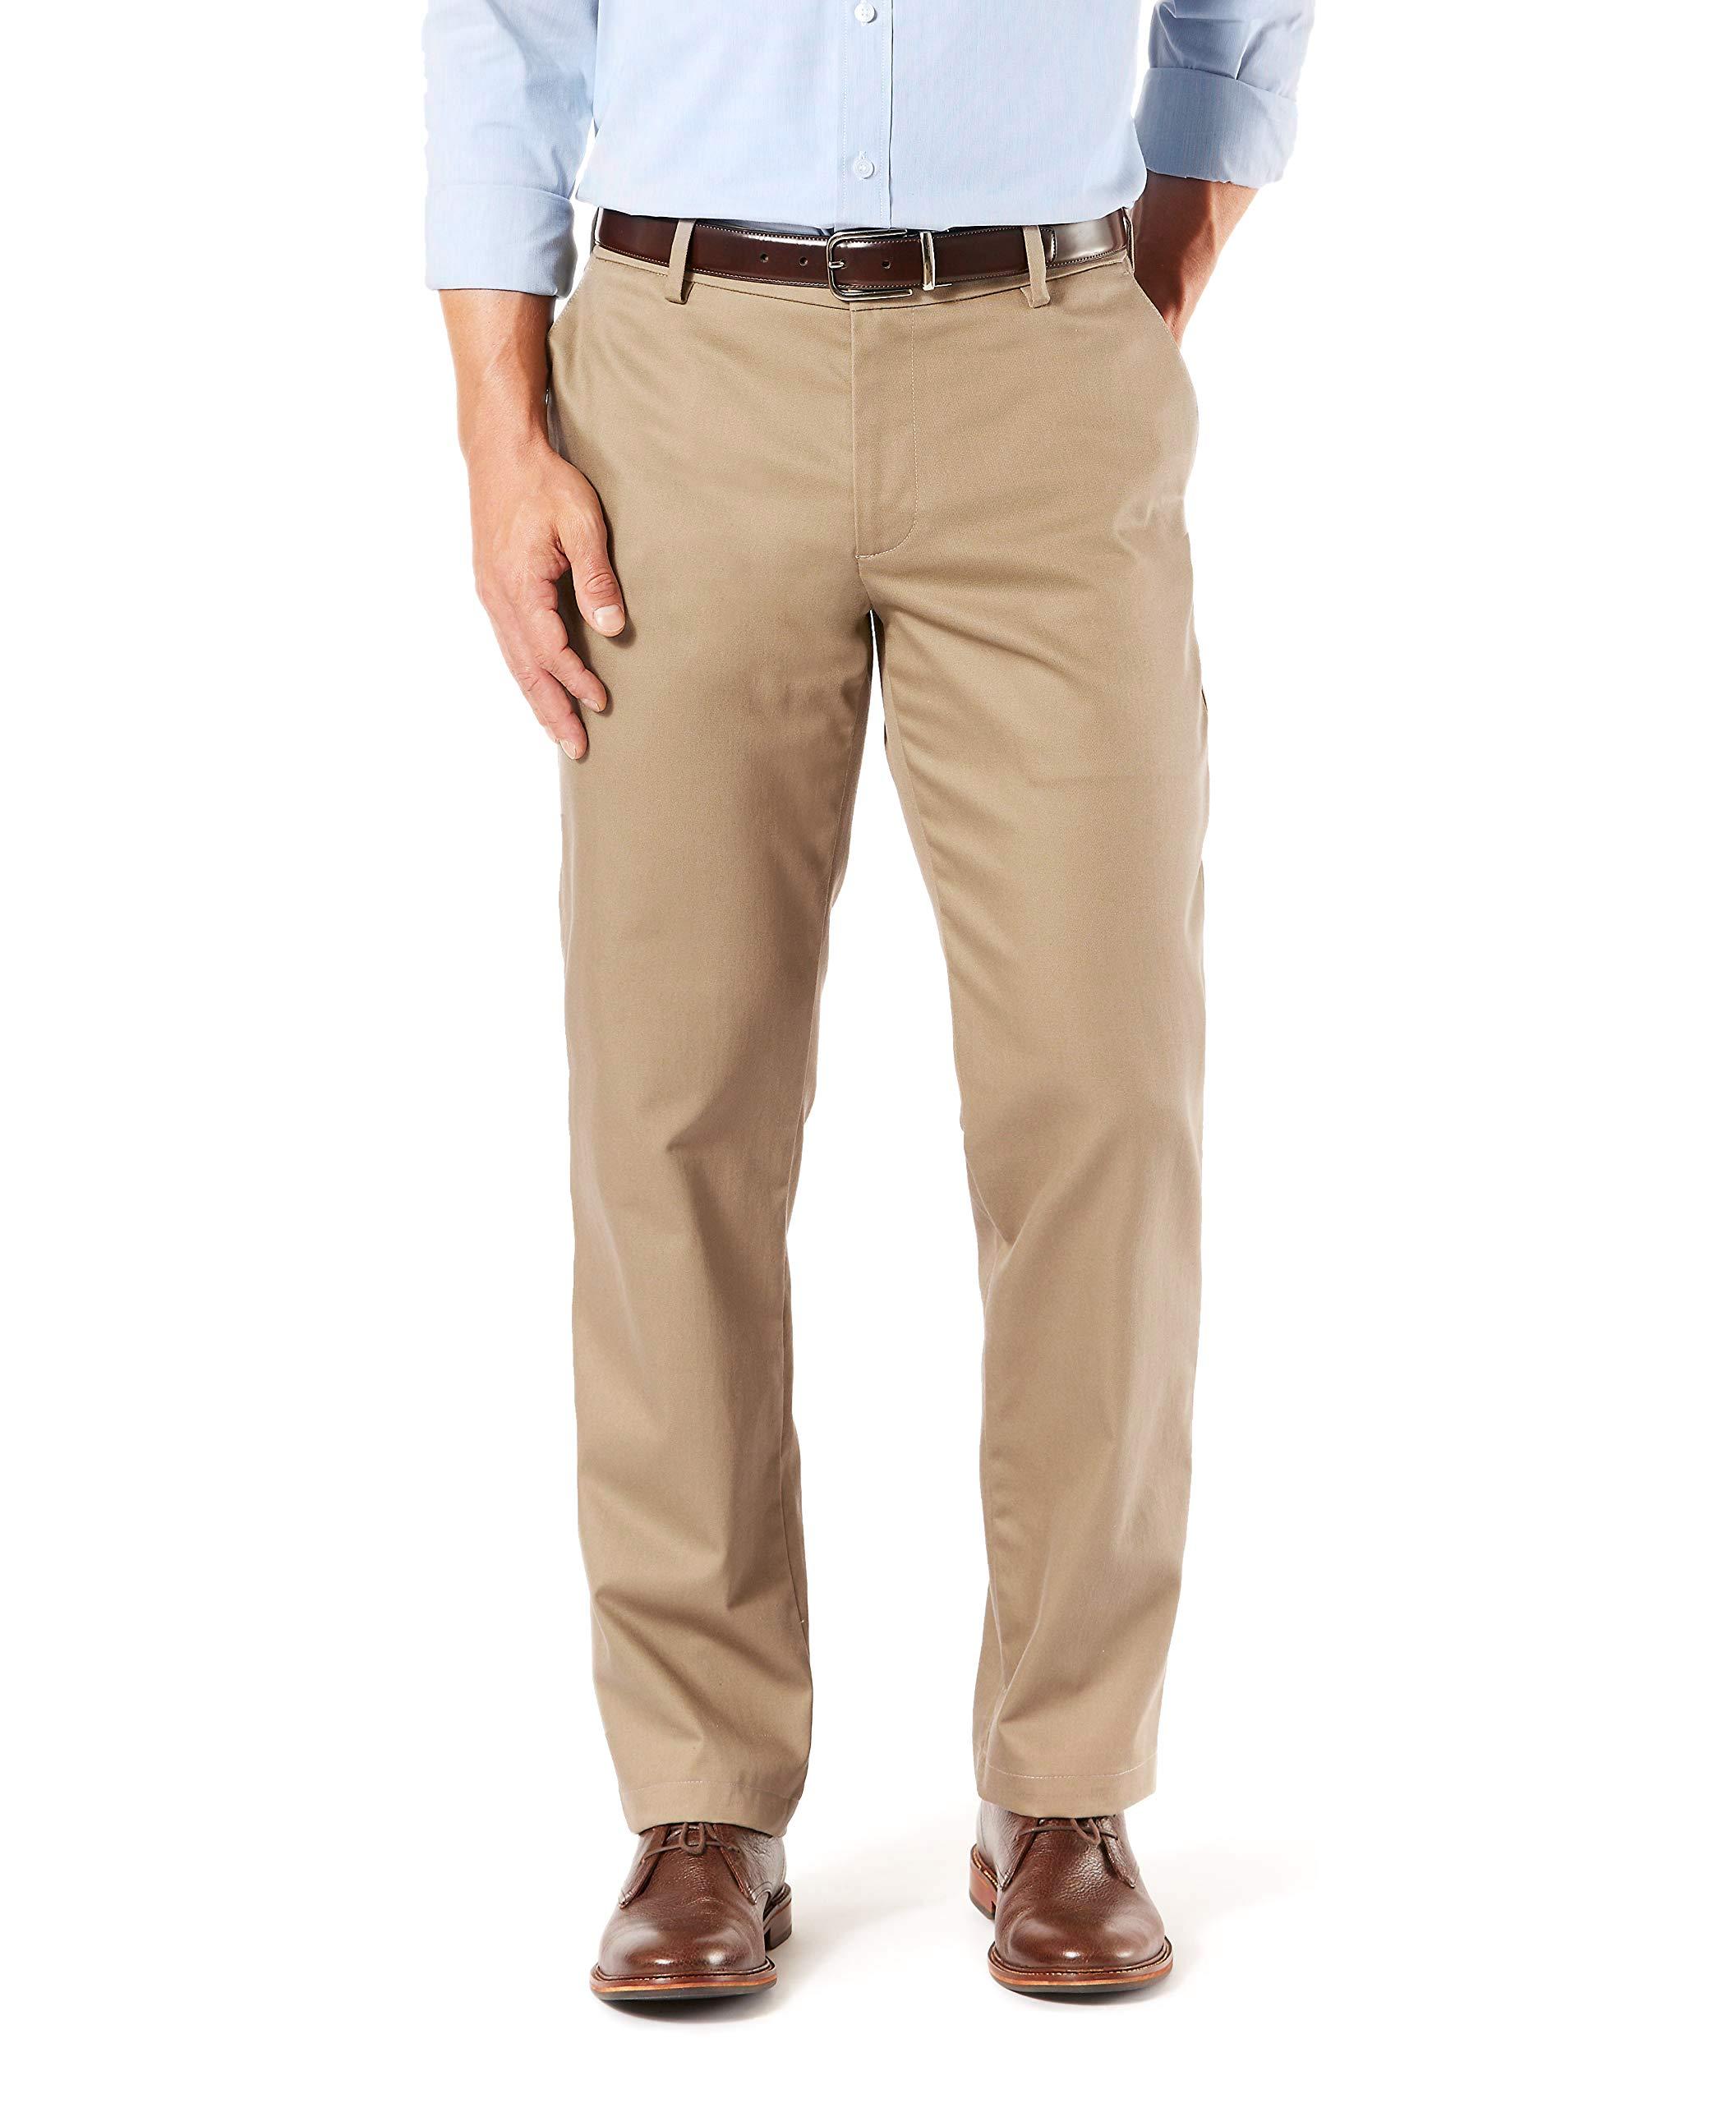 Dockers Men's Straight Fit Signature Khaki Lux Cotton Stretch Pants, New British Khaki, 36 32